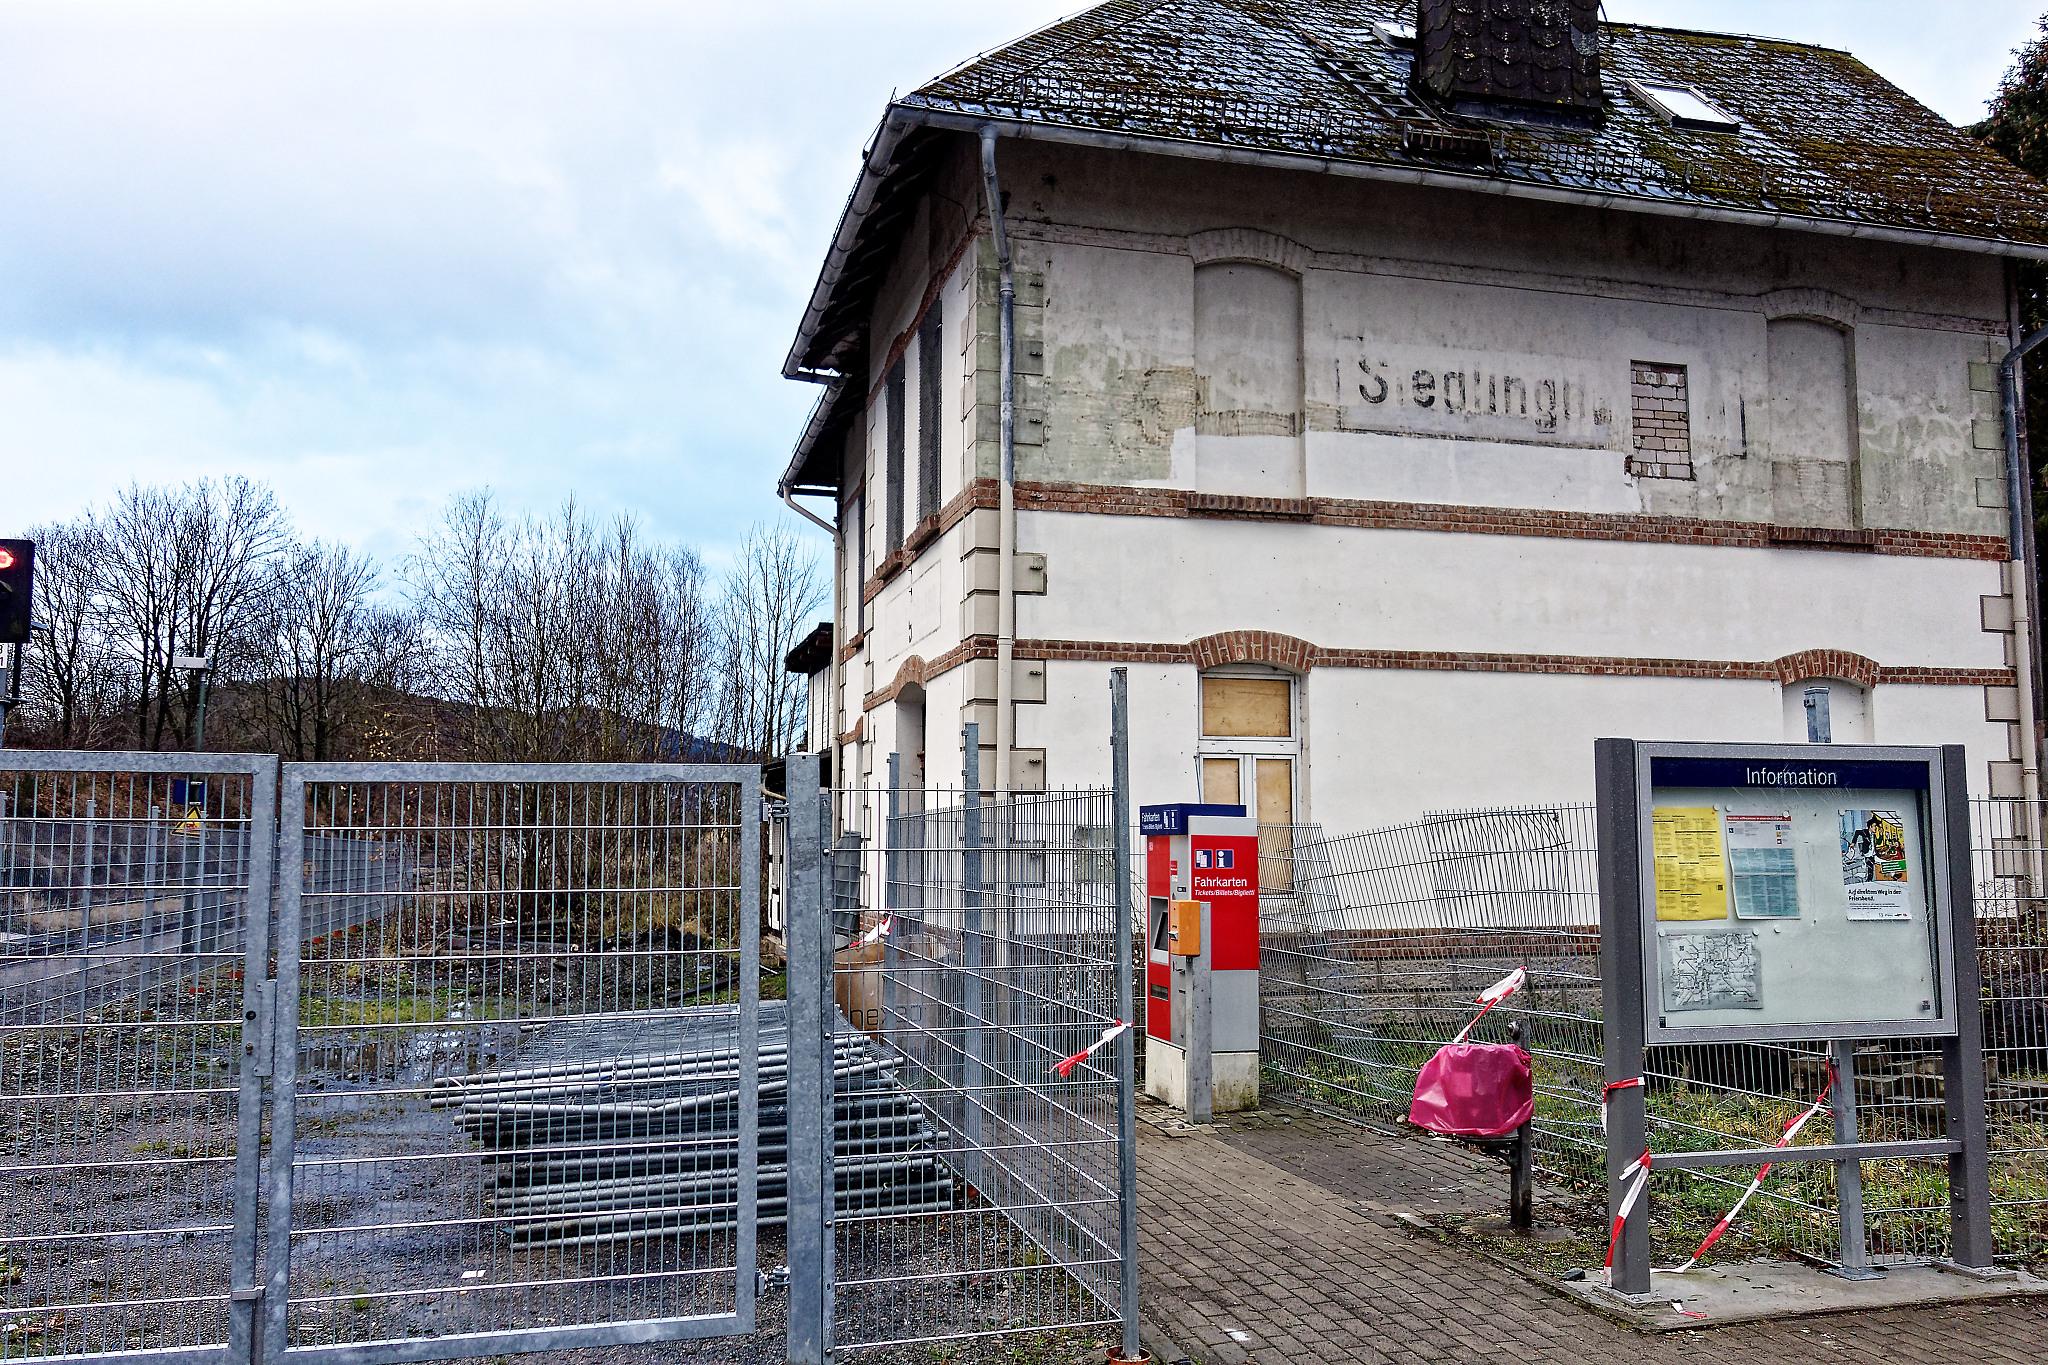 Bordell düsseldorf hauptbahnhof